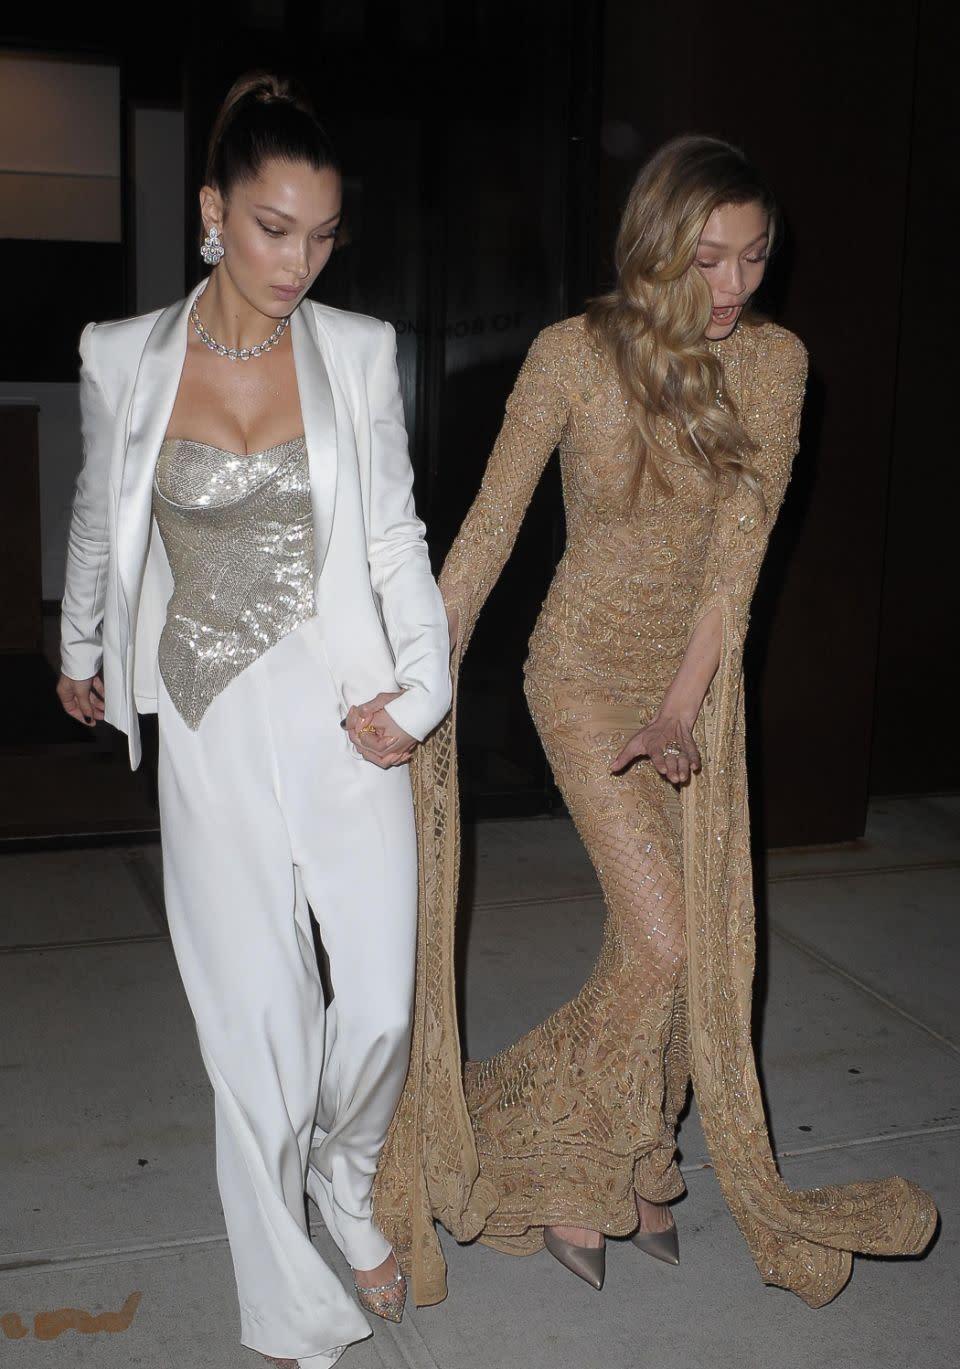 Gigi Hadid trip leaving Glamour Women of the Year Awards with Bella Hadid